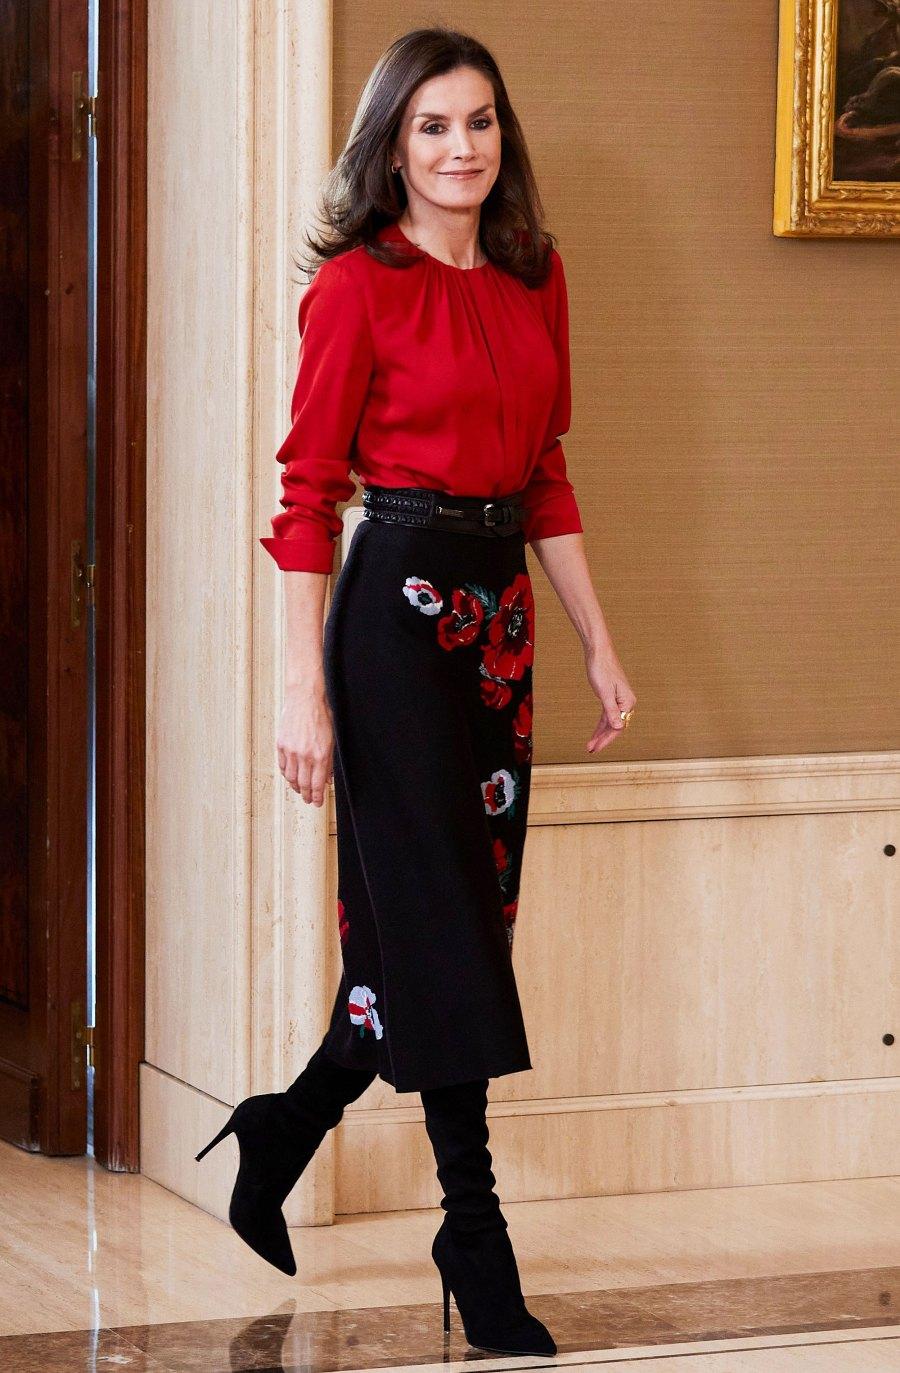 Queen Letizia Floral Skirt January 14, 2020